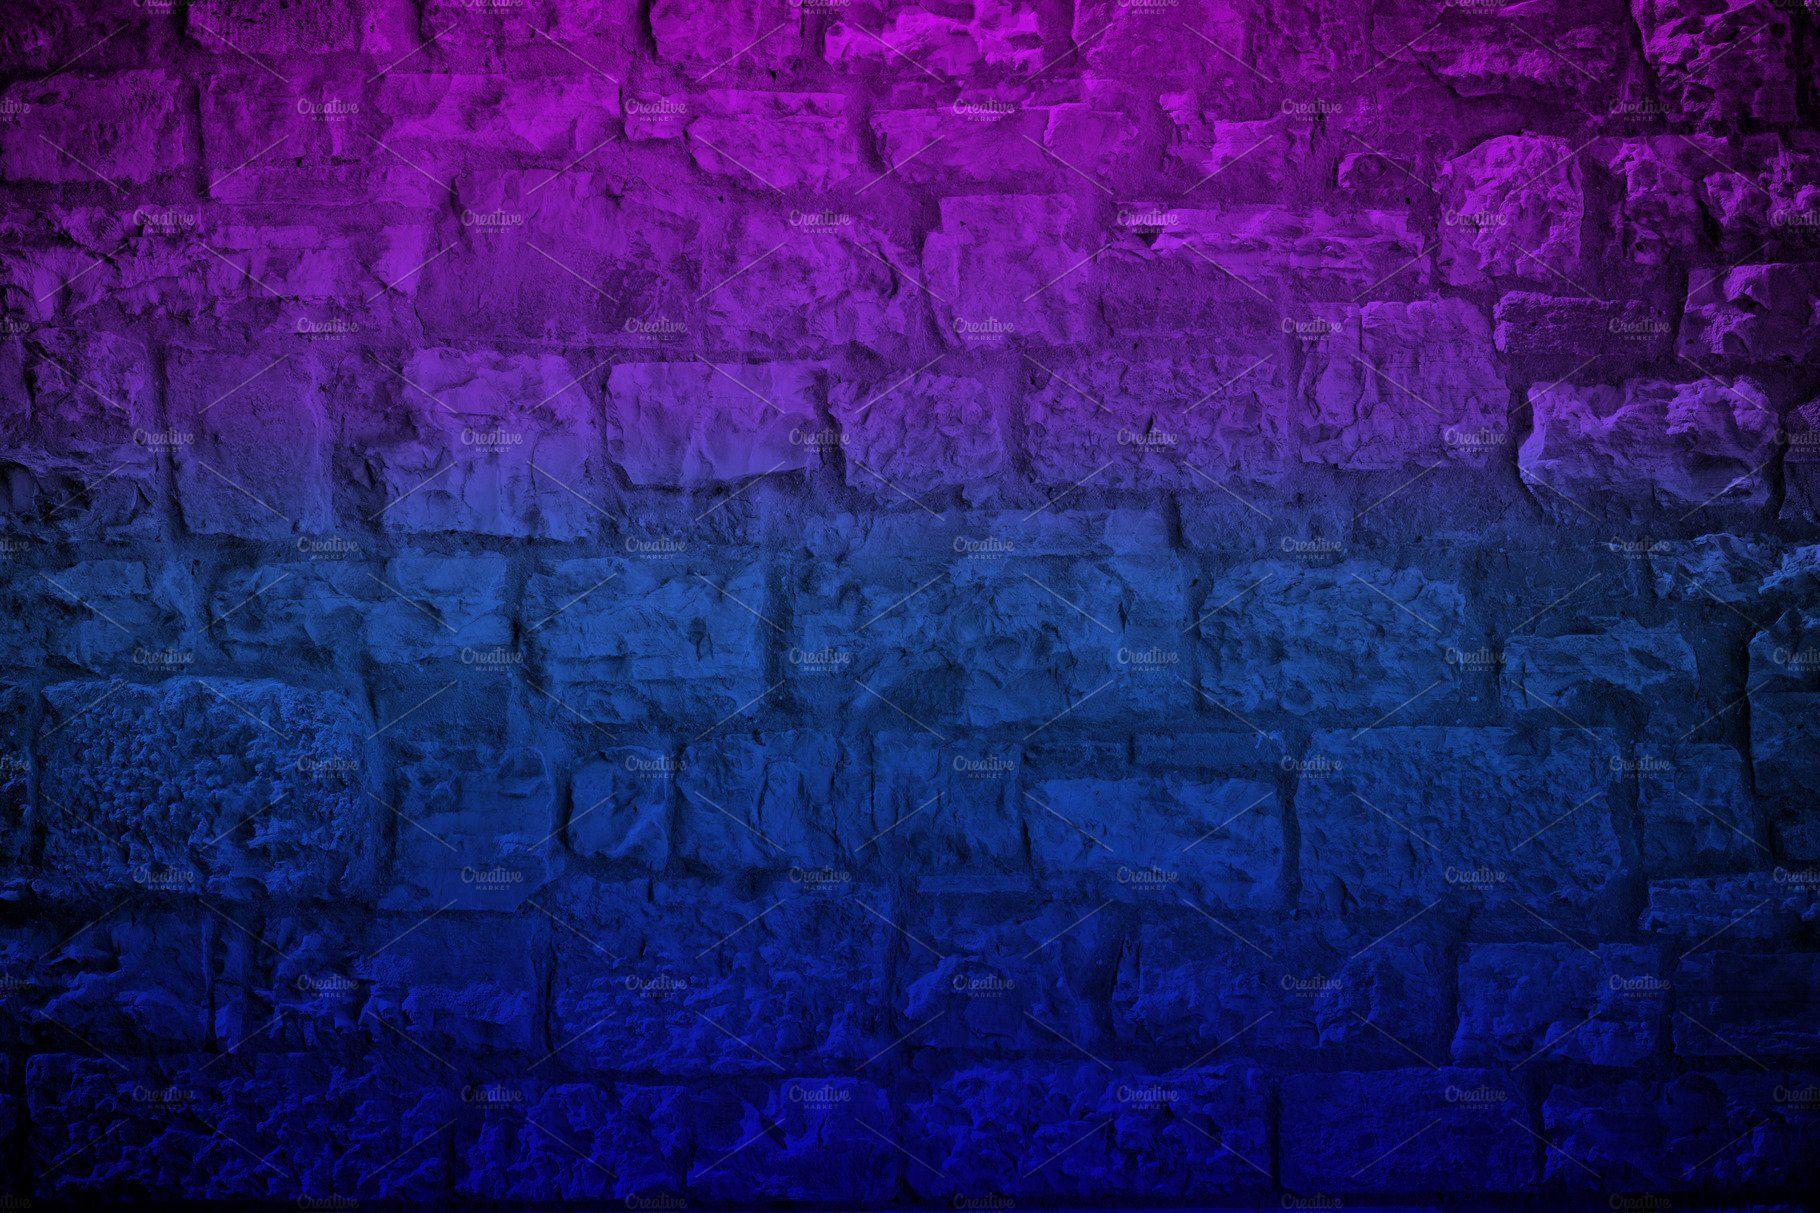 Neon Colored Limestone Brick Wall Wallpaper Backgrounds Dark Brick Wall Dark Gradient Background